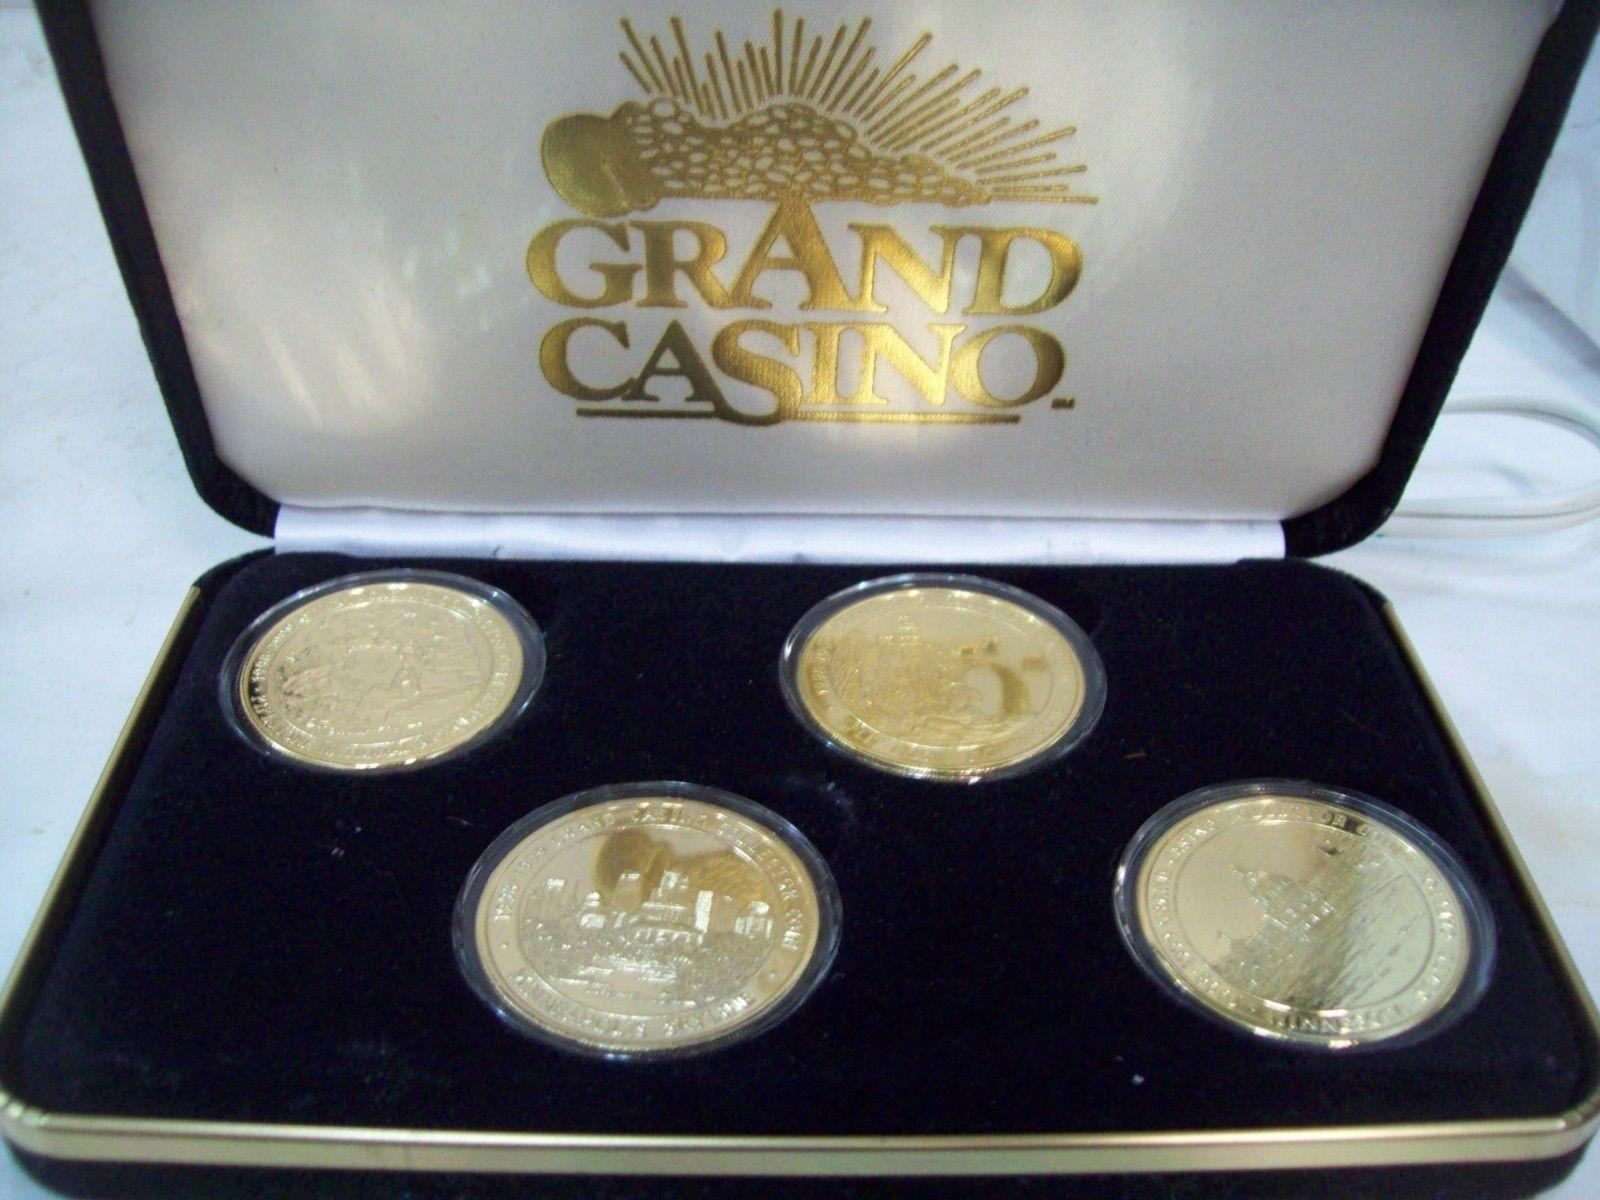 Grand Casino 1998-1999 Collector/'s Coin Set